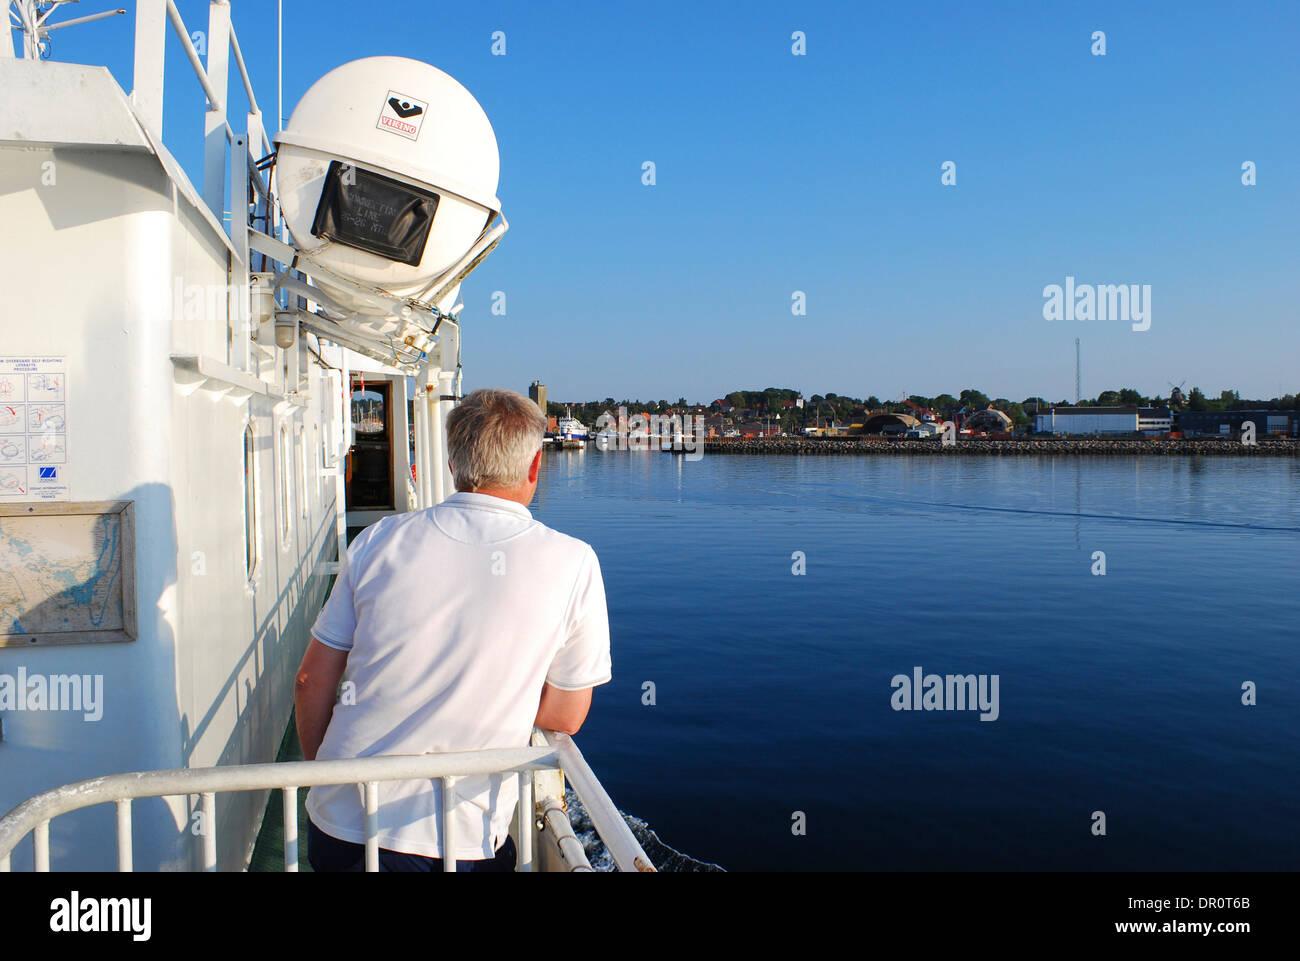 Aero island, ferry at soeby, fyn, Denmark, Scandinavia, Europe - Stock Image